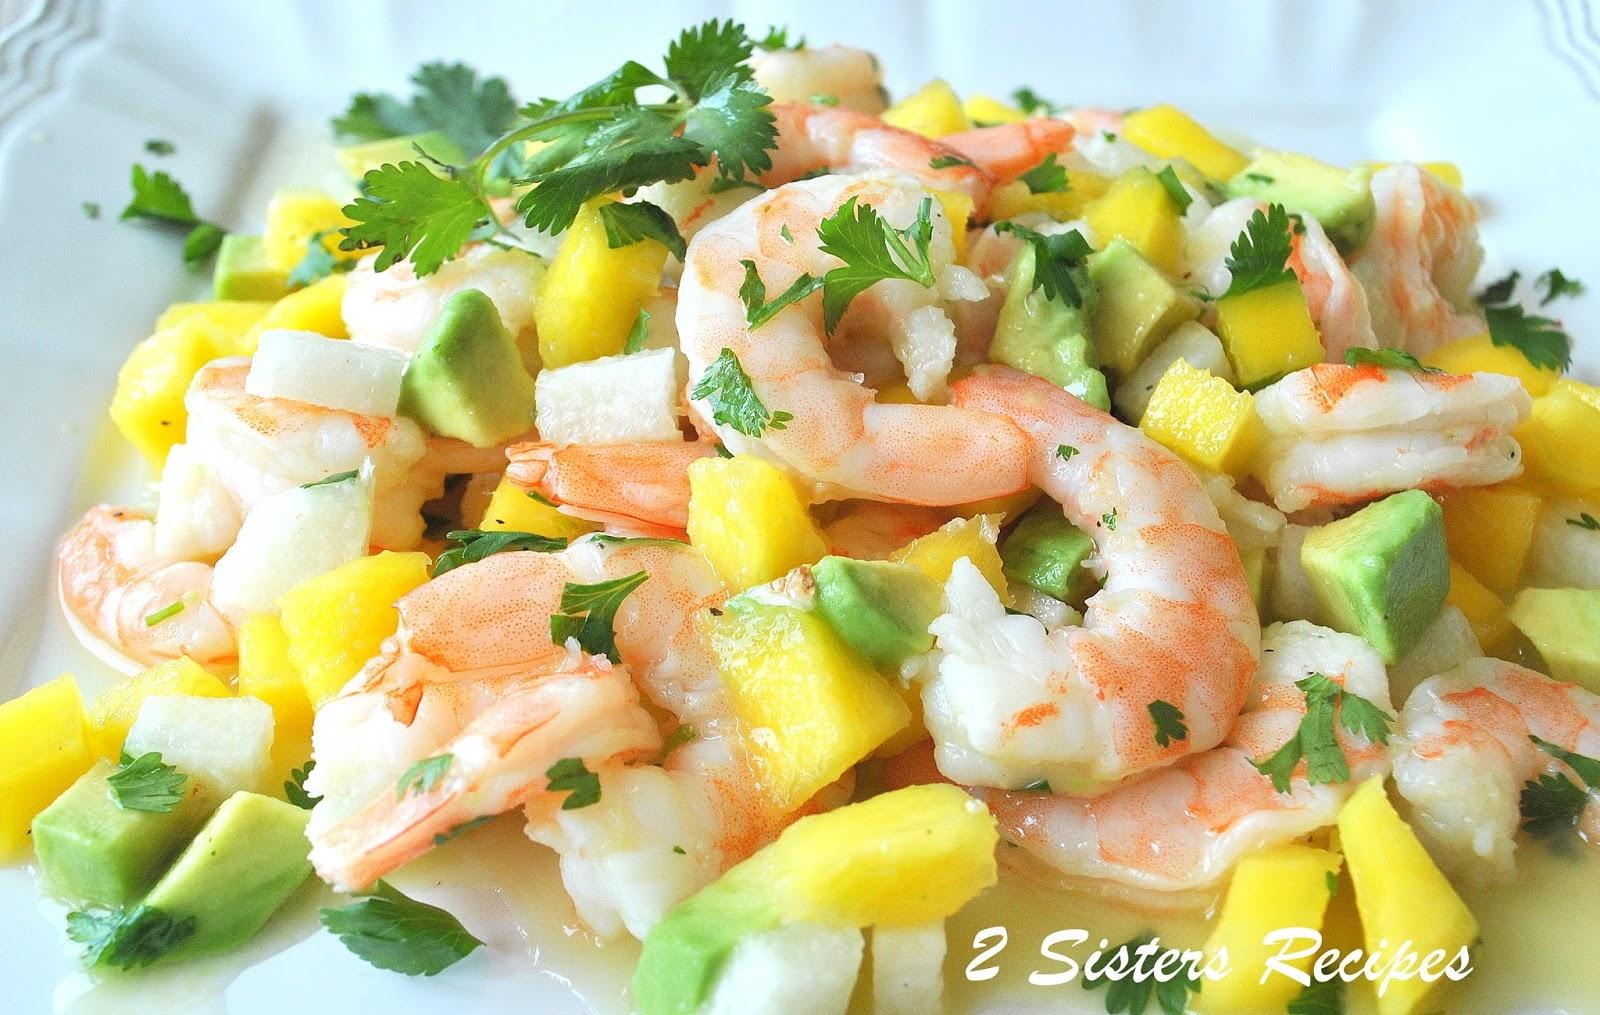 Zesty Lemon Shrimp and Mango Salad - 2 Sisters Recipes by ...